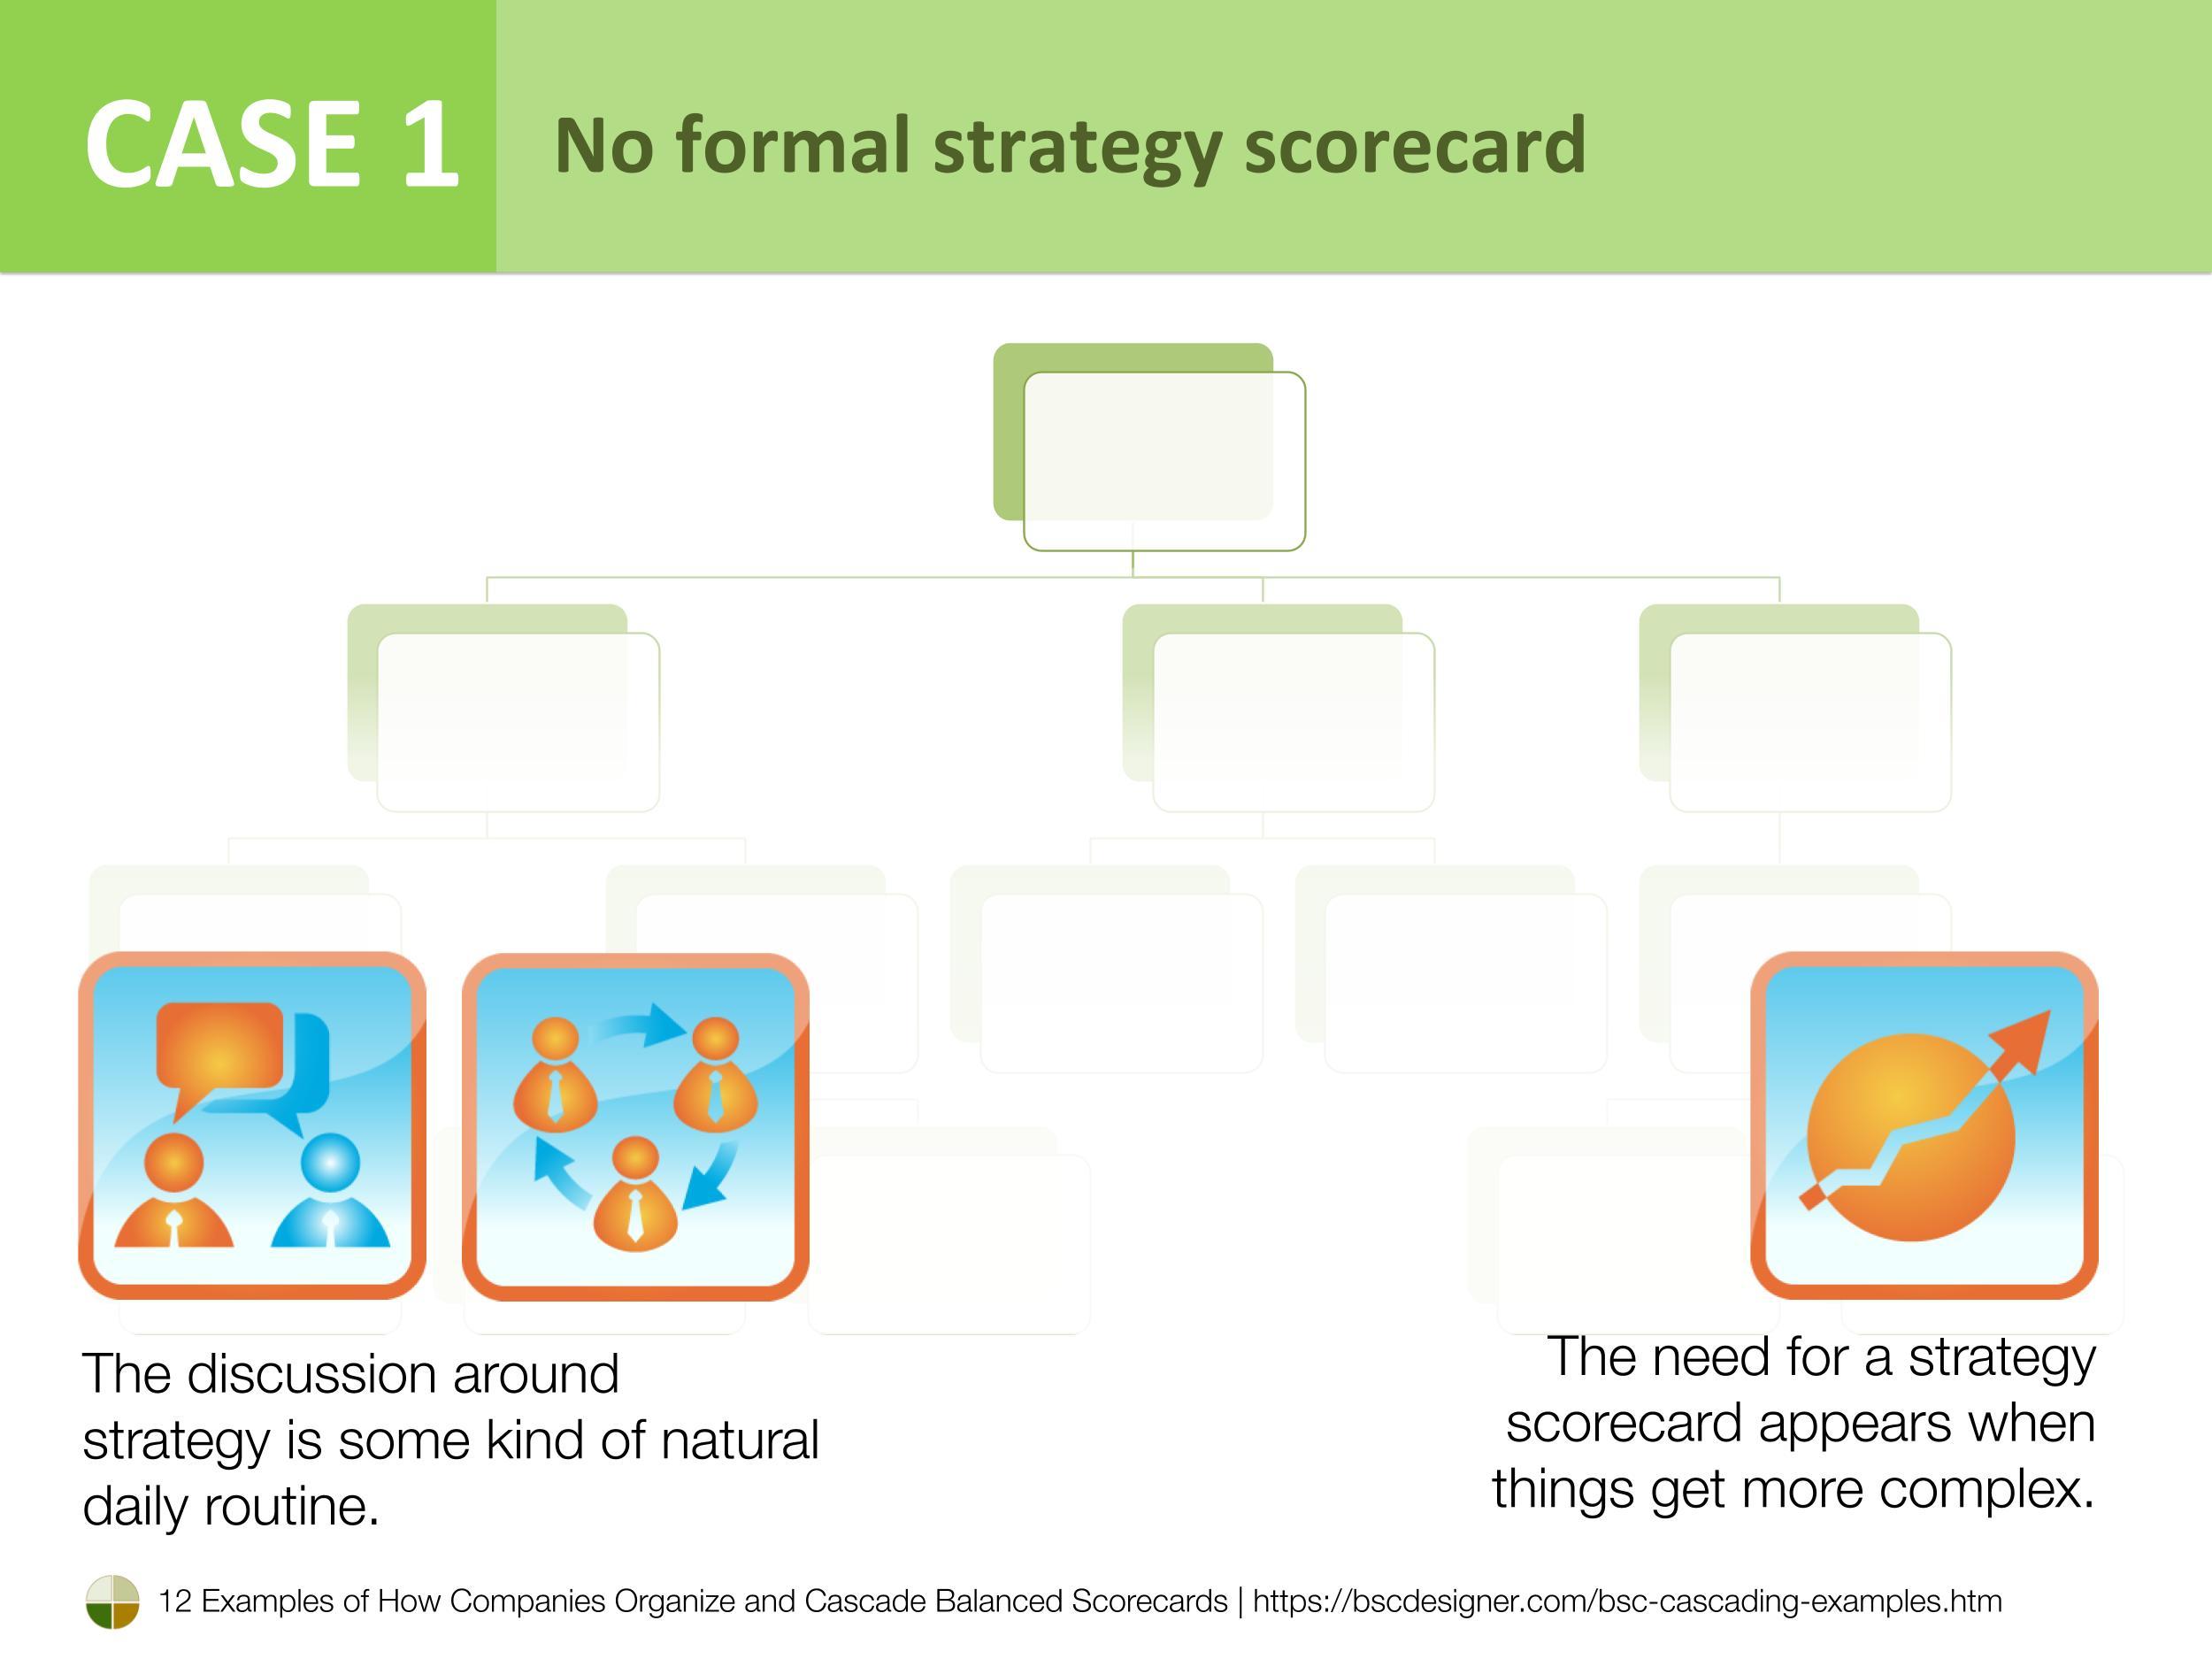 Case 1 - No formal strategy scorecard